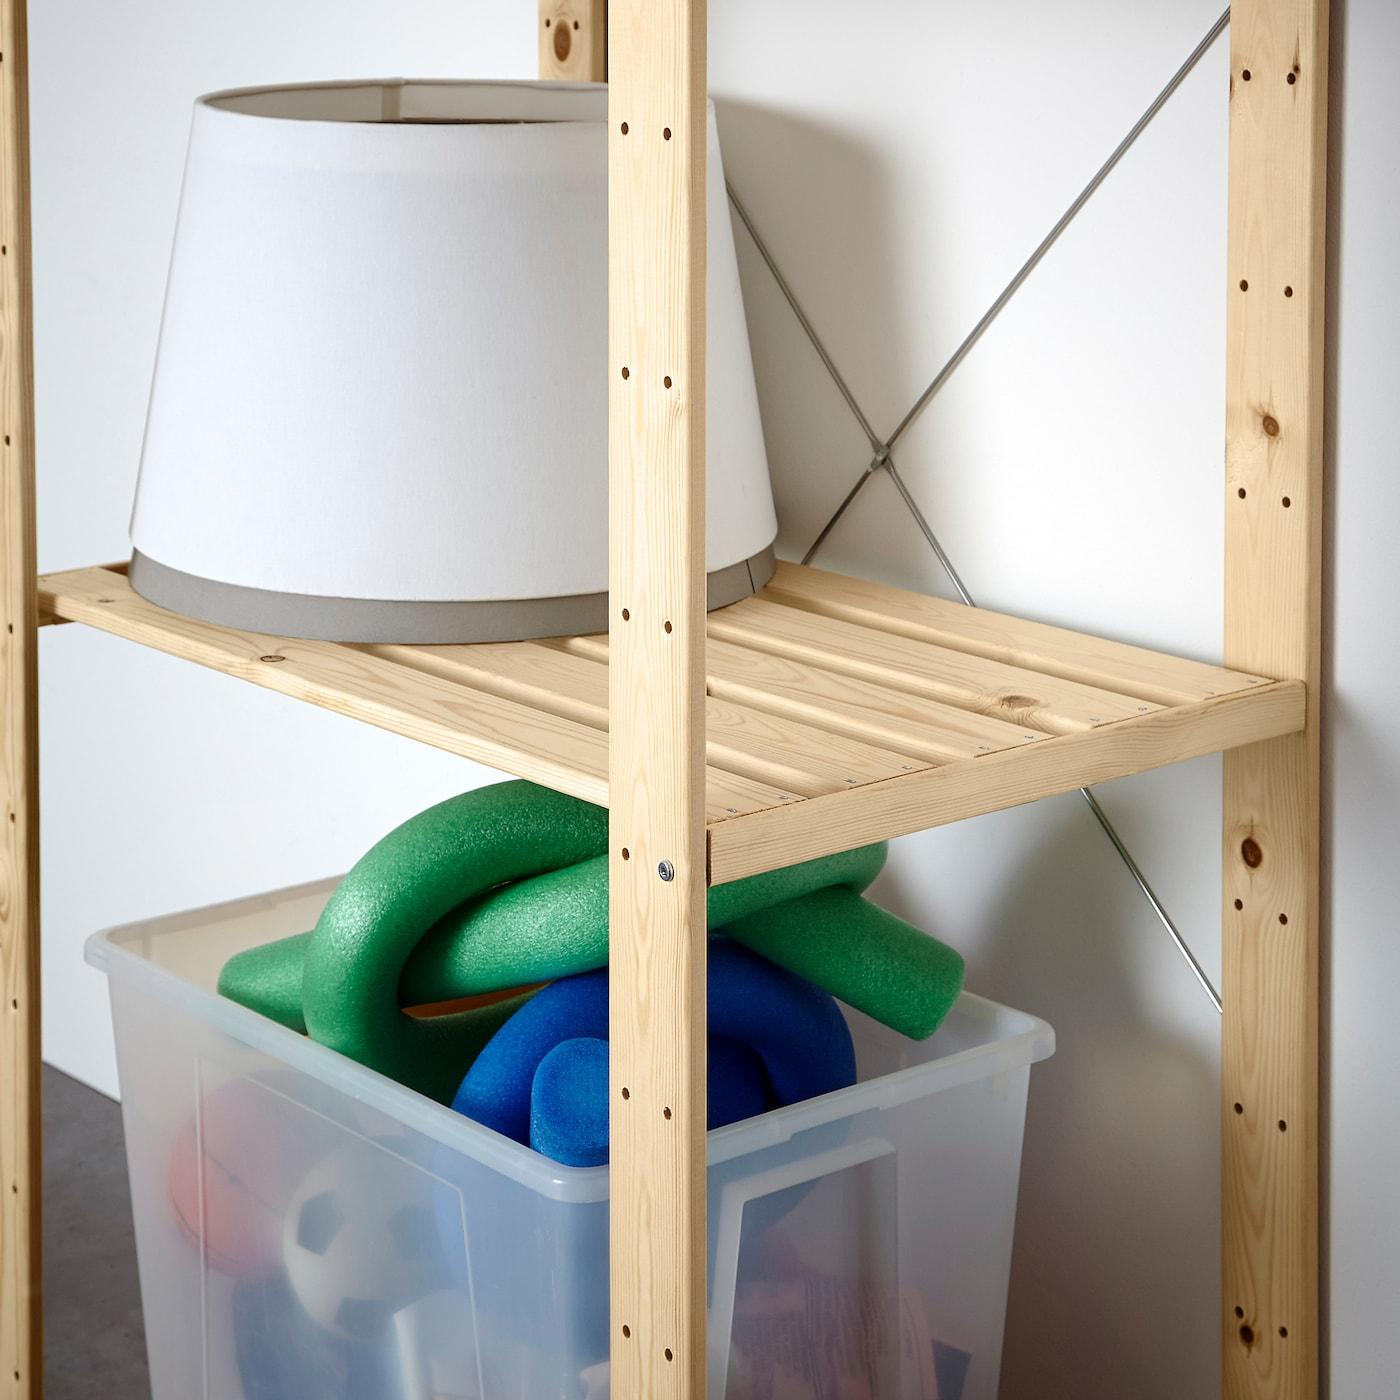 HEJNE softwood, 1 section, 78x50x171 cm